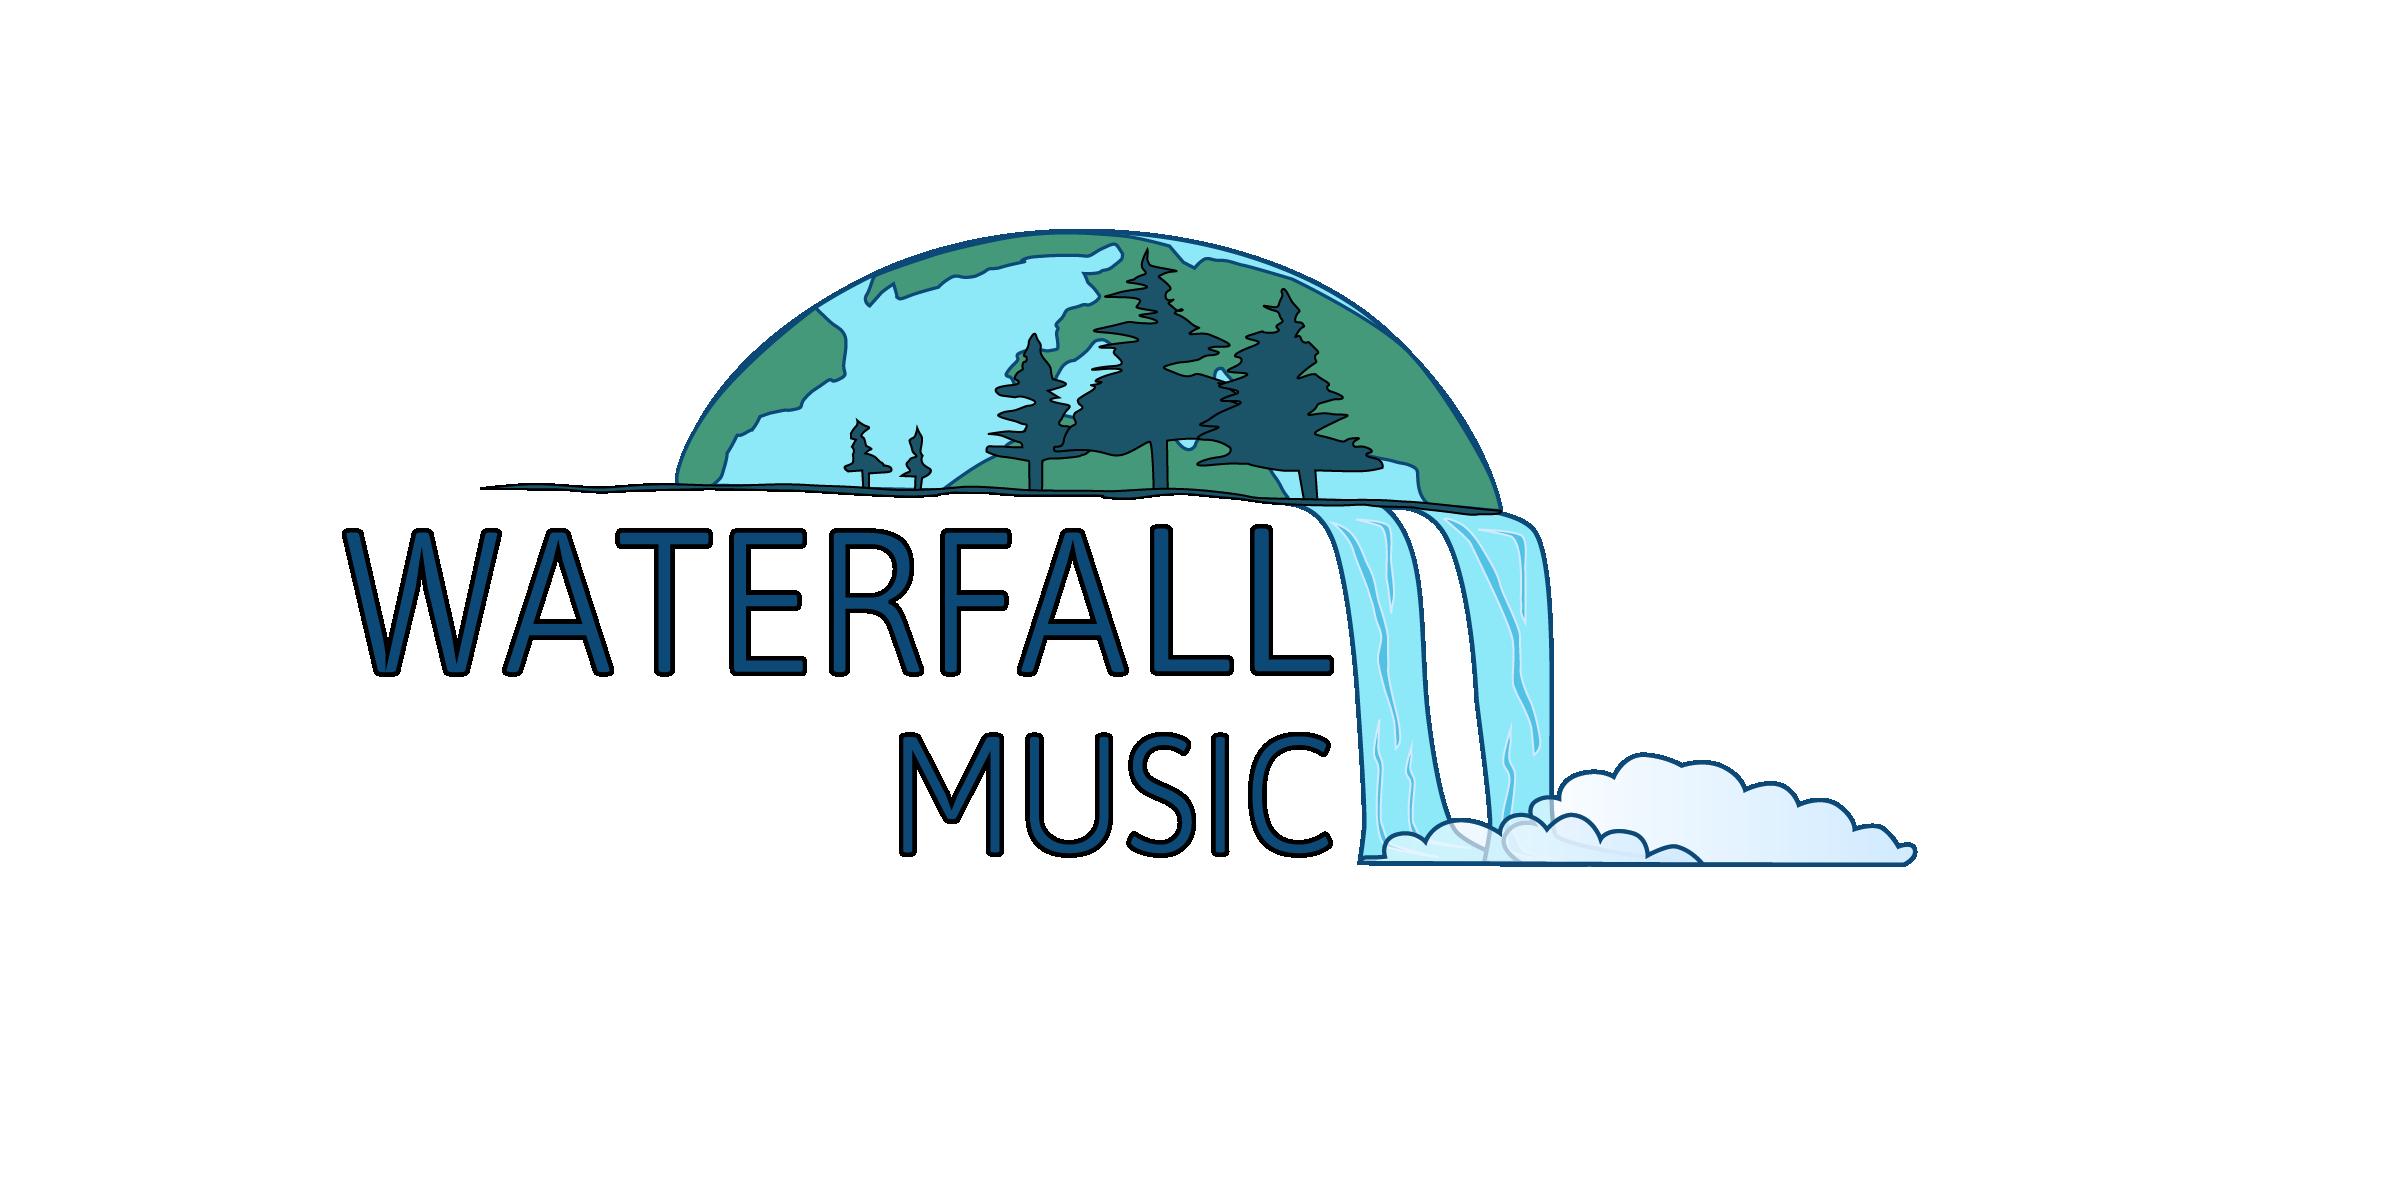 WaterFallMusic_FinalChoice-01.png